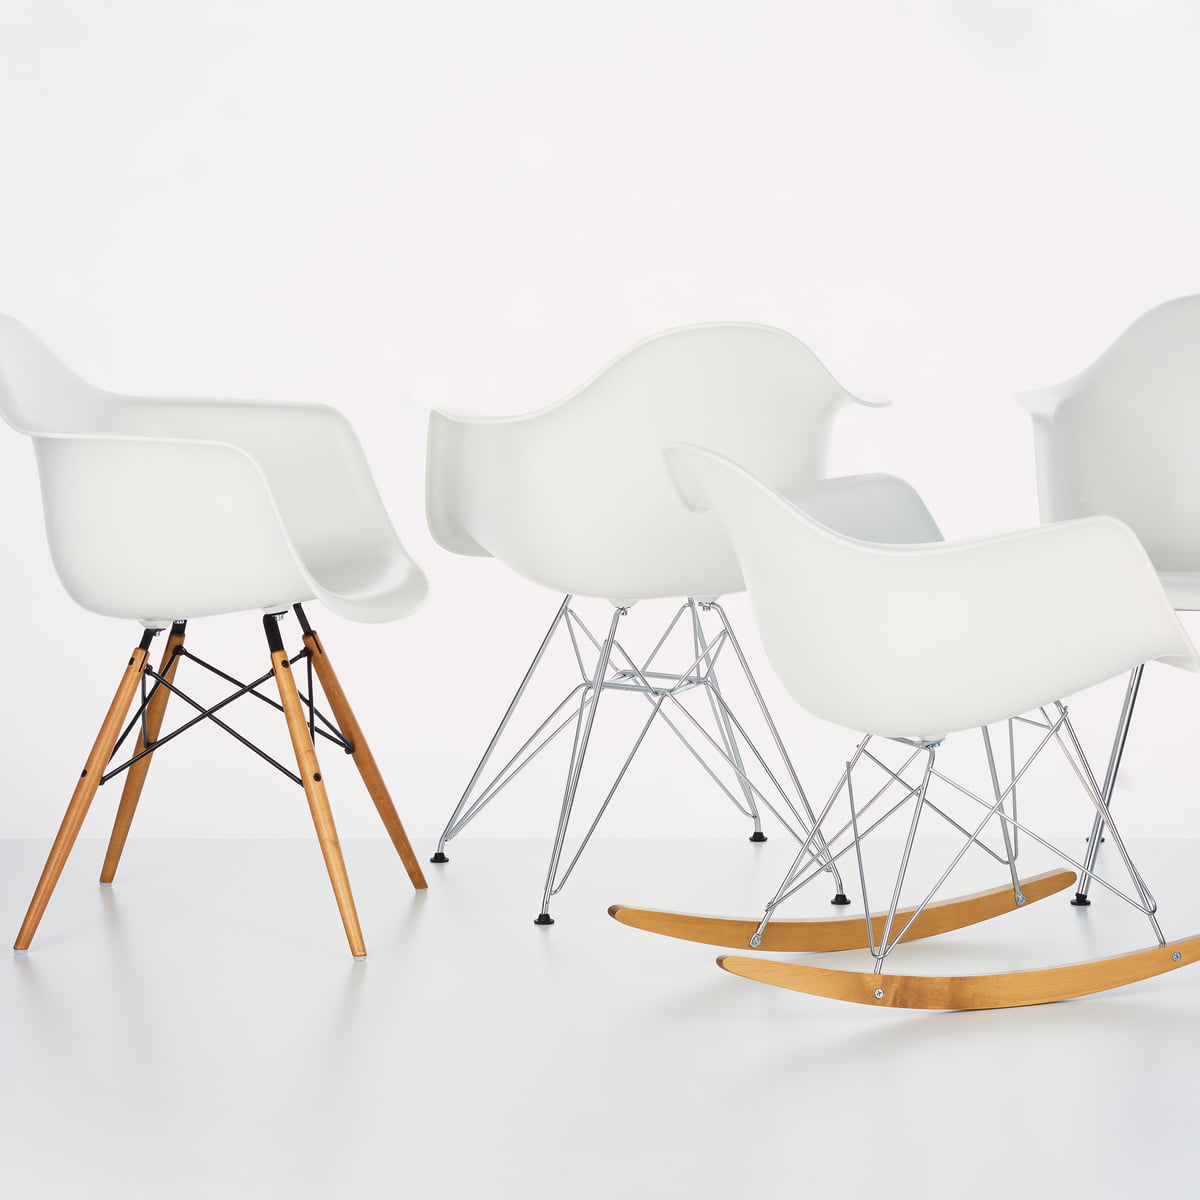 vitra eames rar fauteuil à bascule - Chaise A Bascule Eames 2